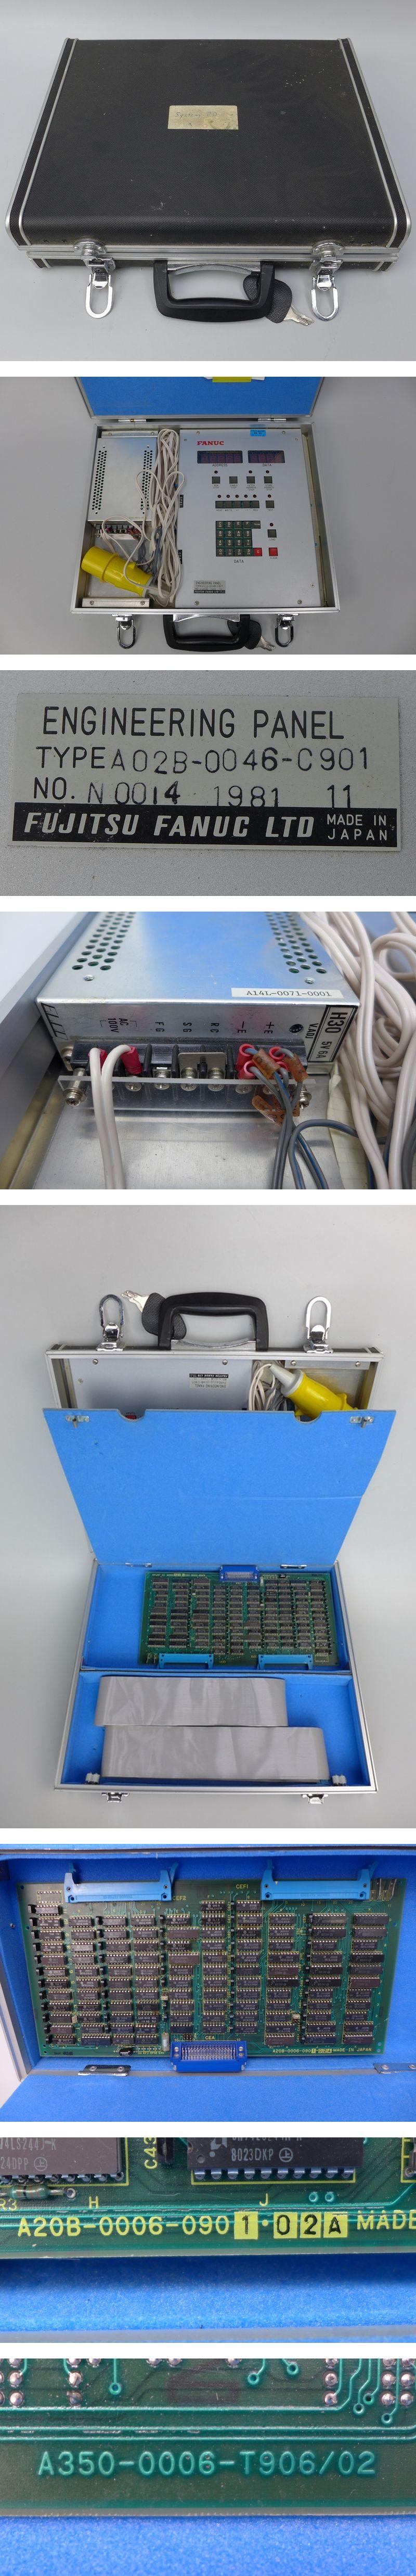 Fanuc Engineering Panel A02B-0046-C901 No N0014 1981 11